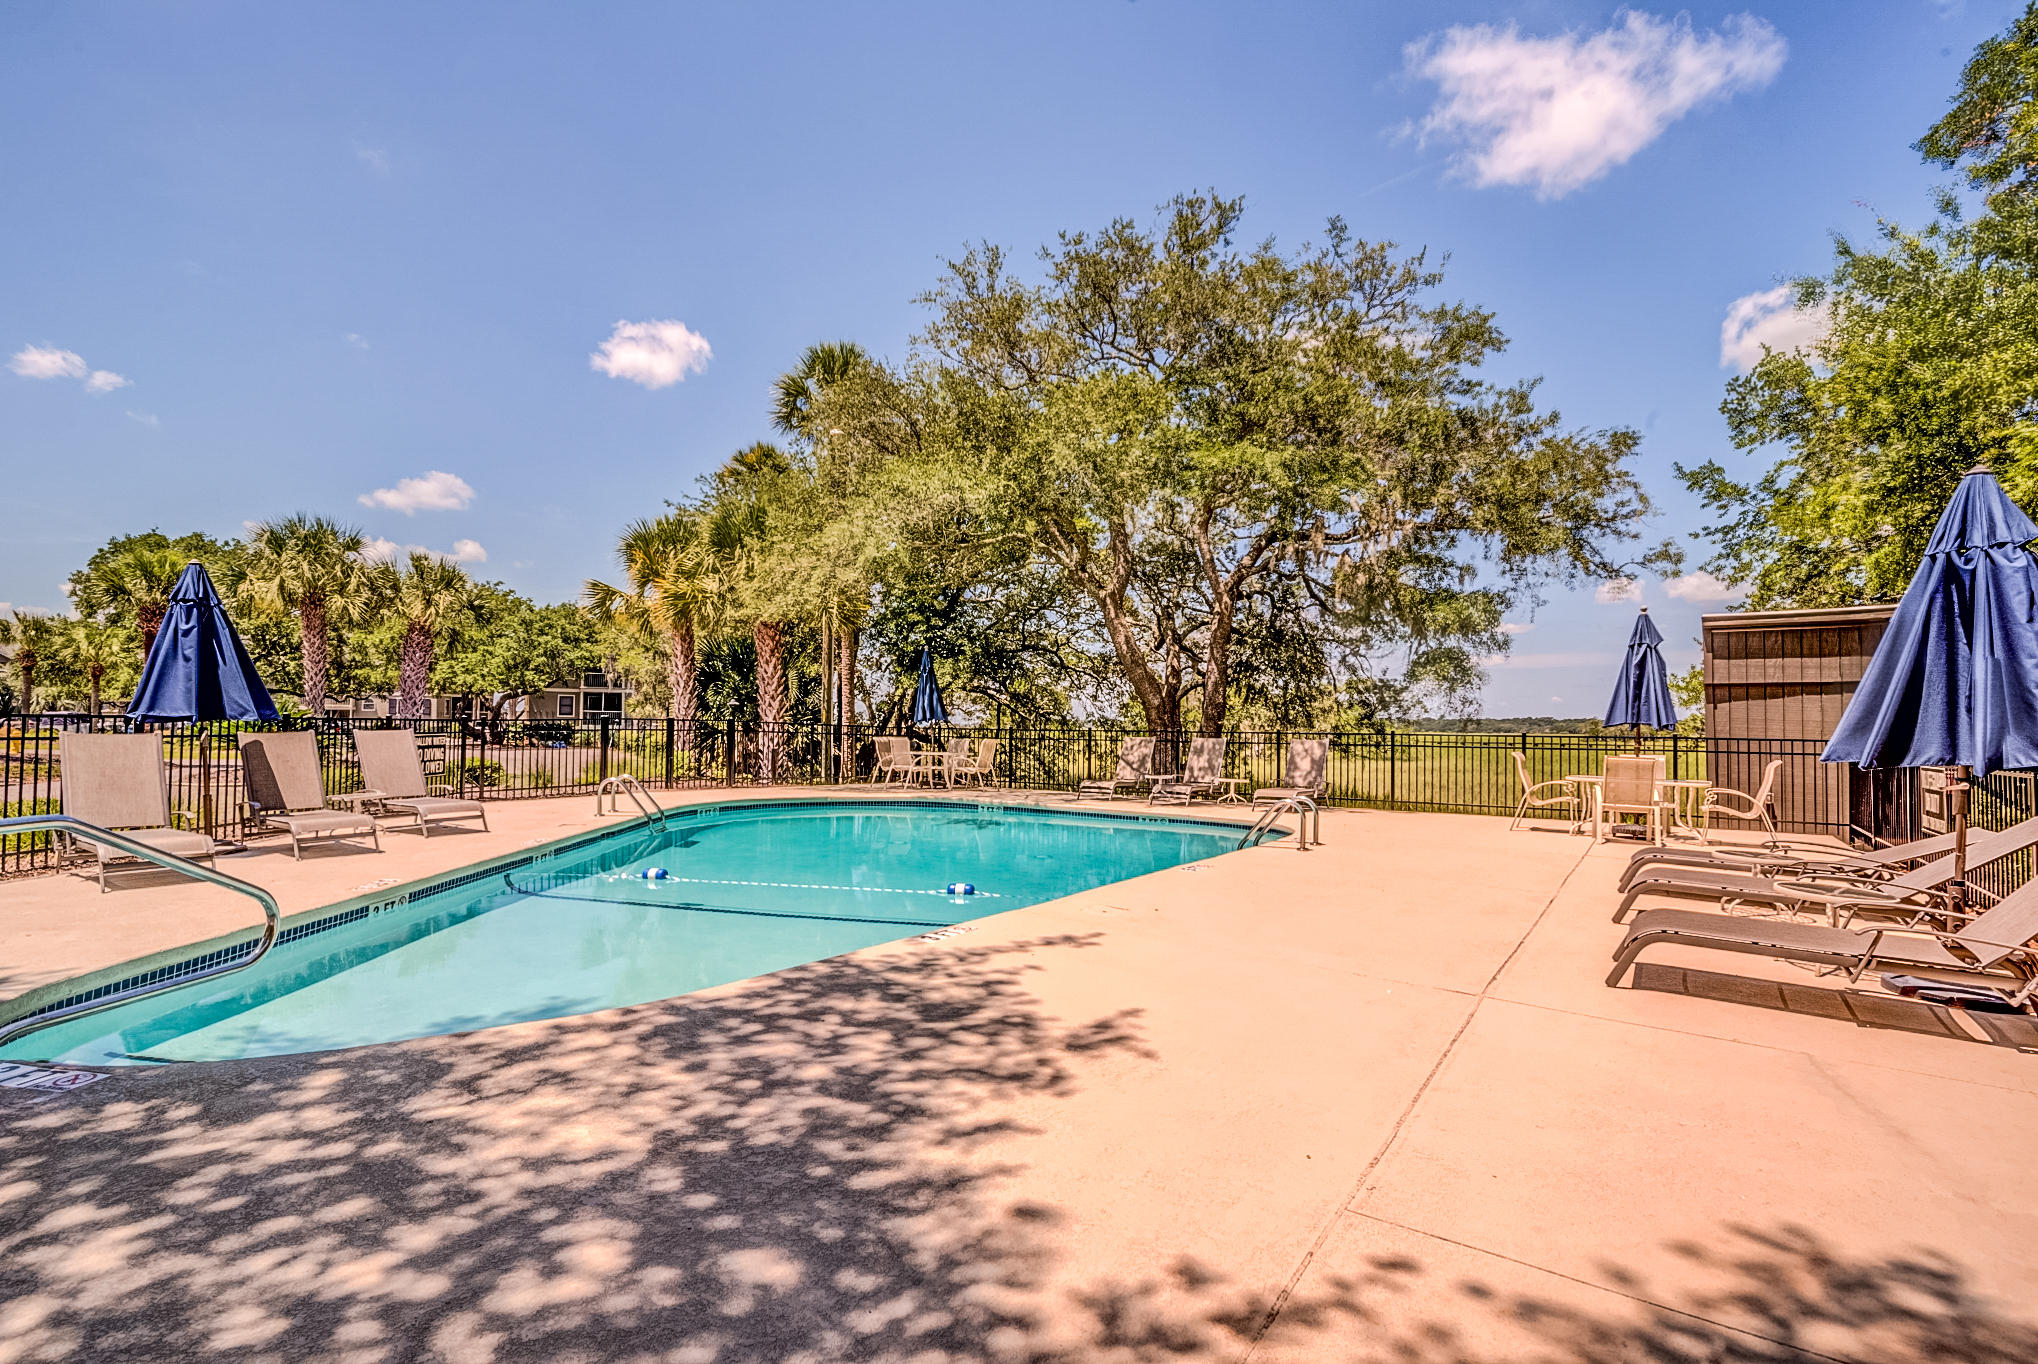 Bay Pointe Villas Homes For Sale - 2127 Landfall, Johns Island, SC - 10